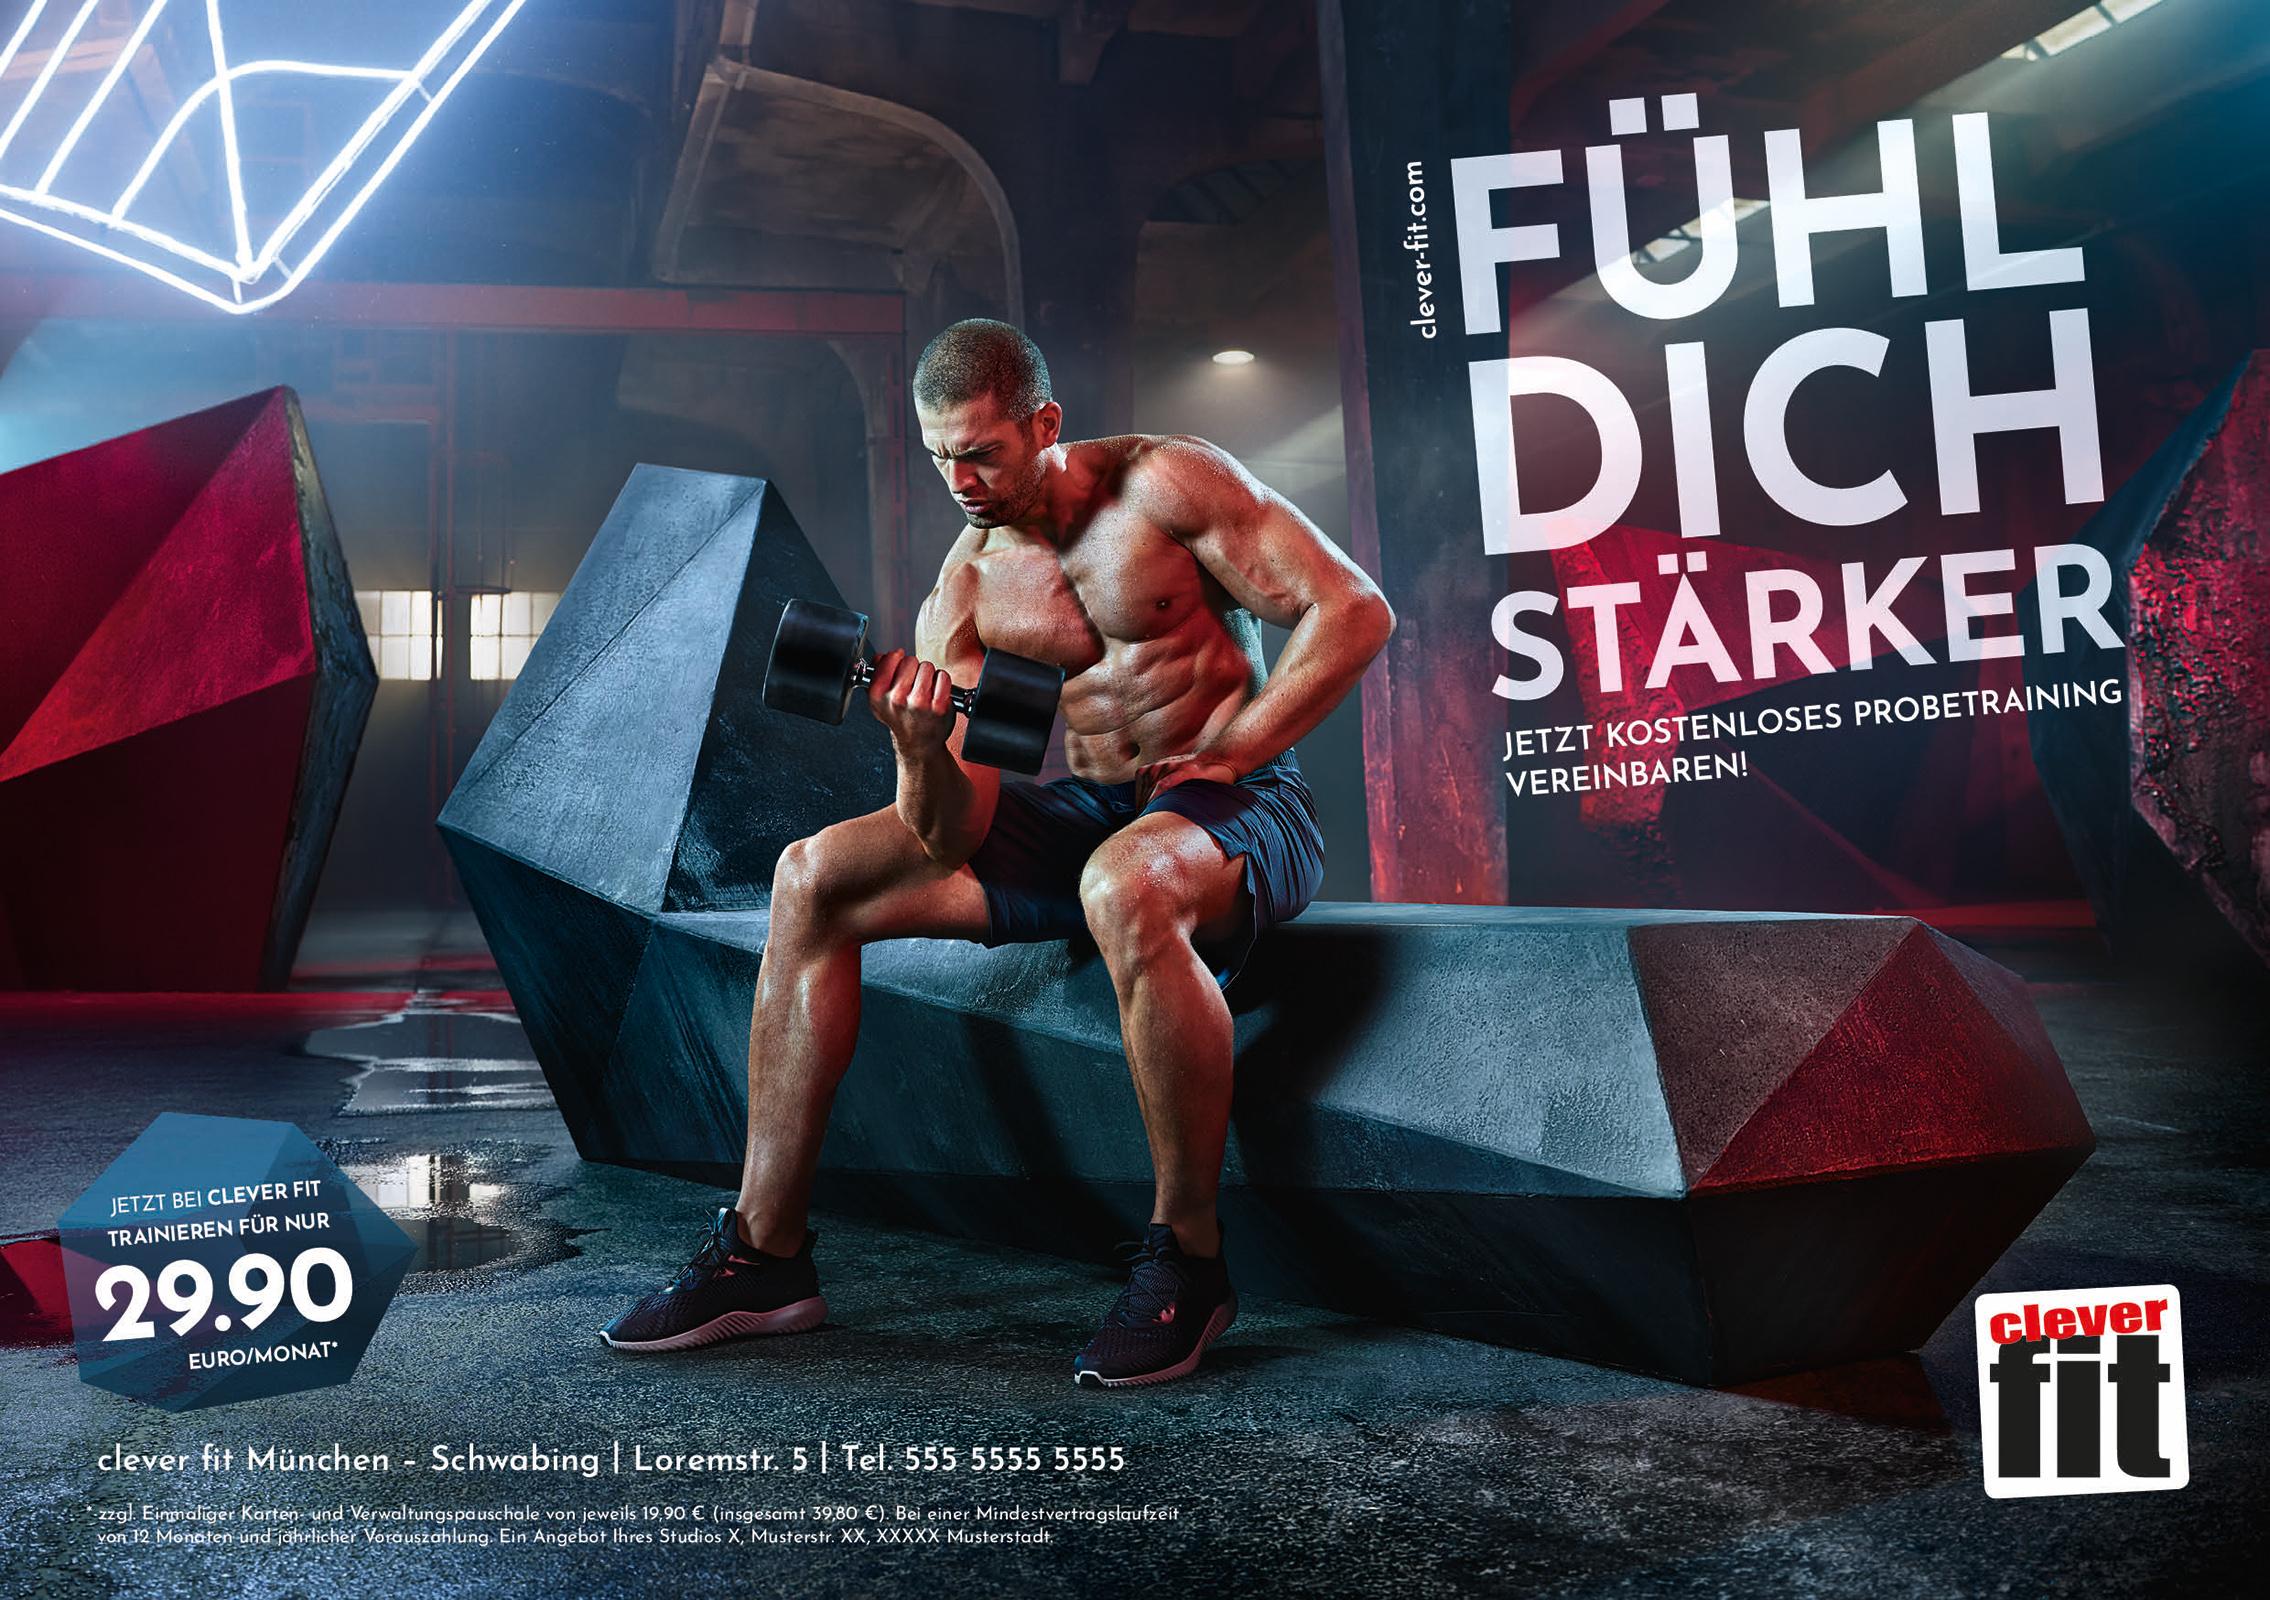 FÜHL DICH FIT ADVENTSKALENDER 2019